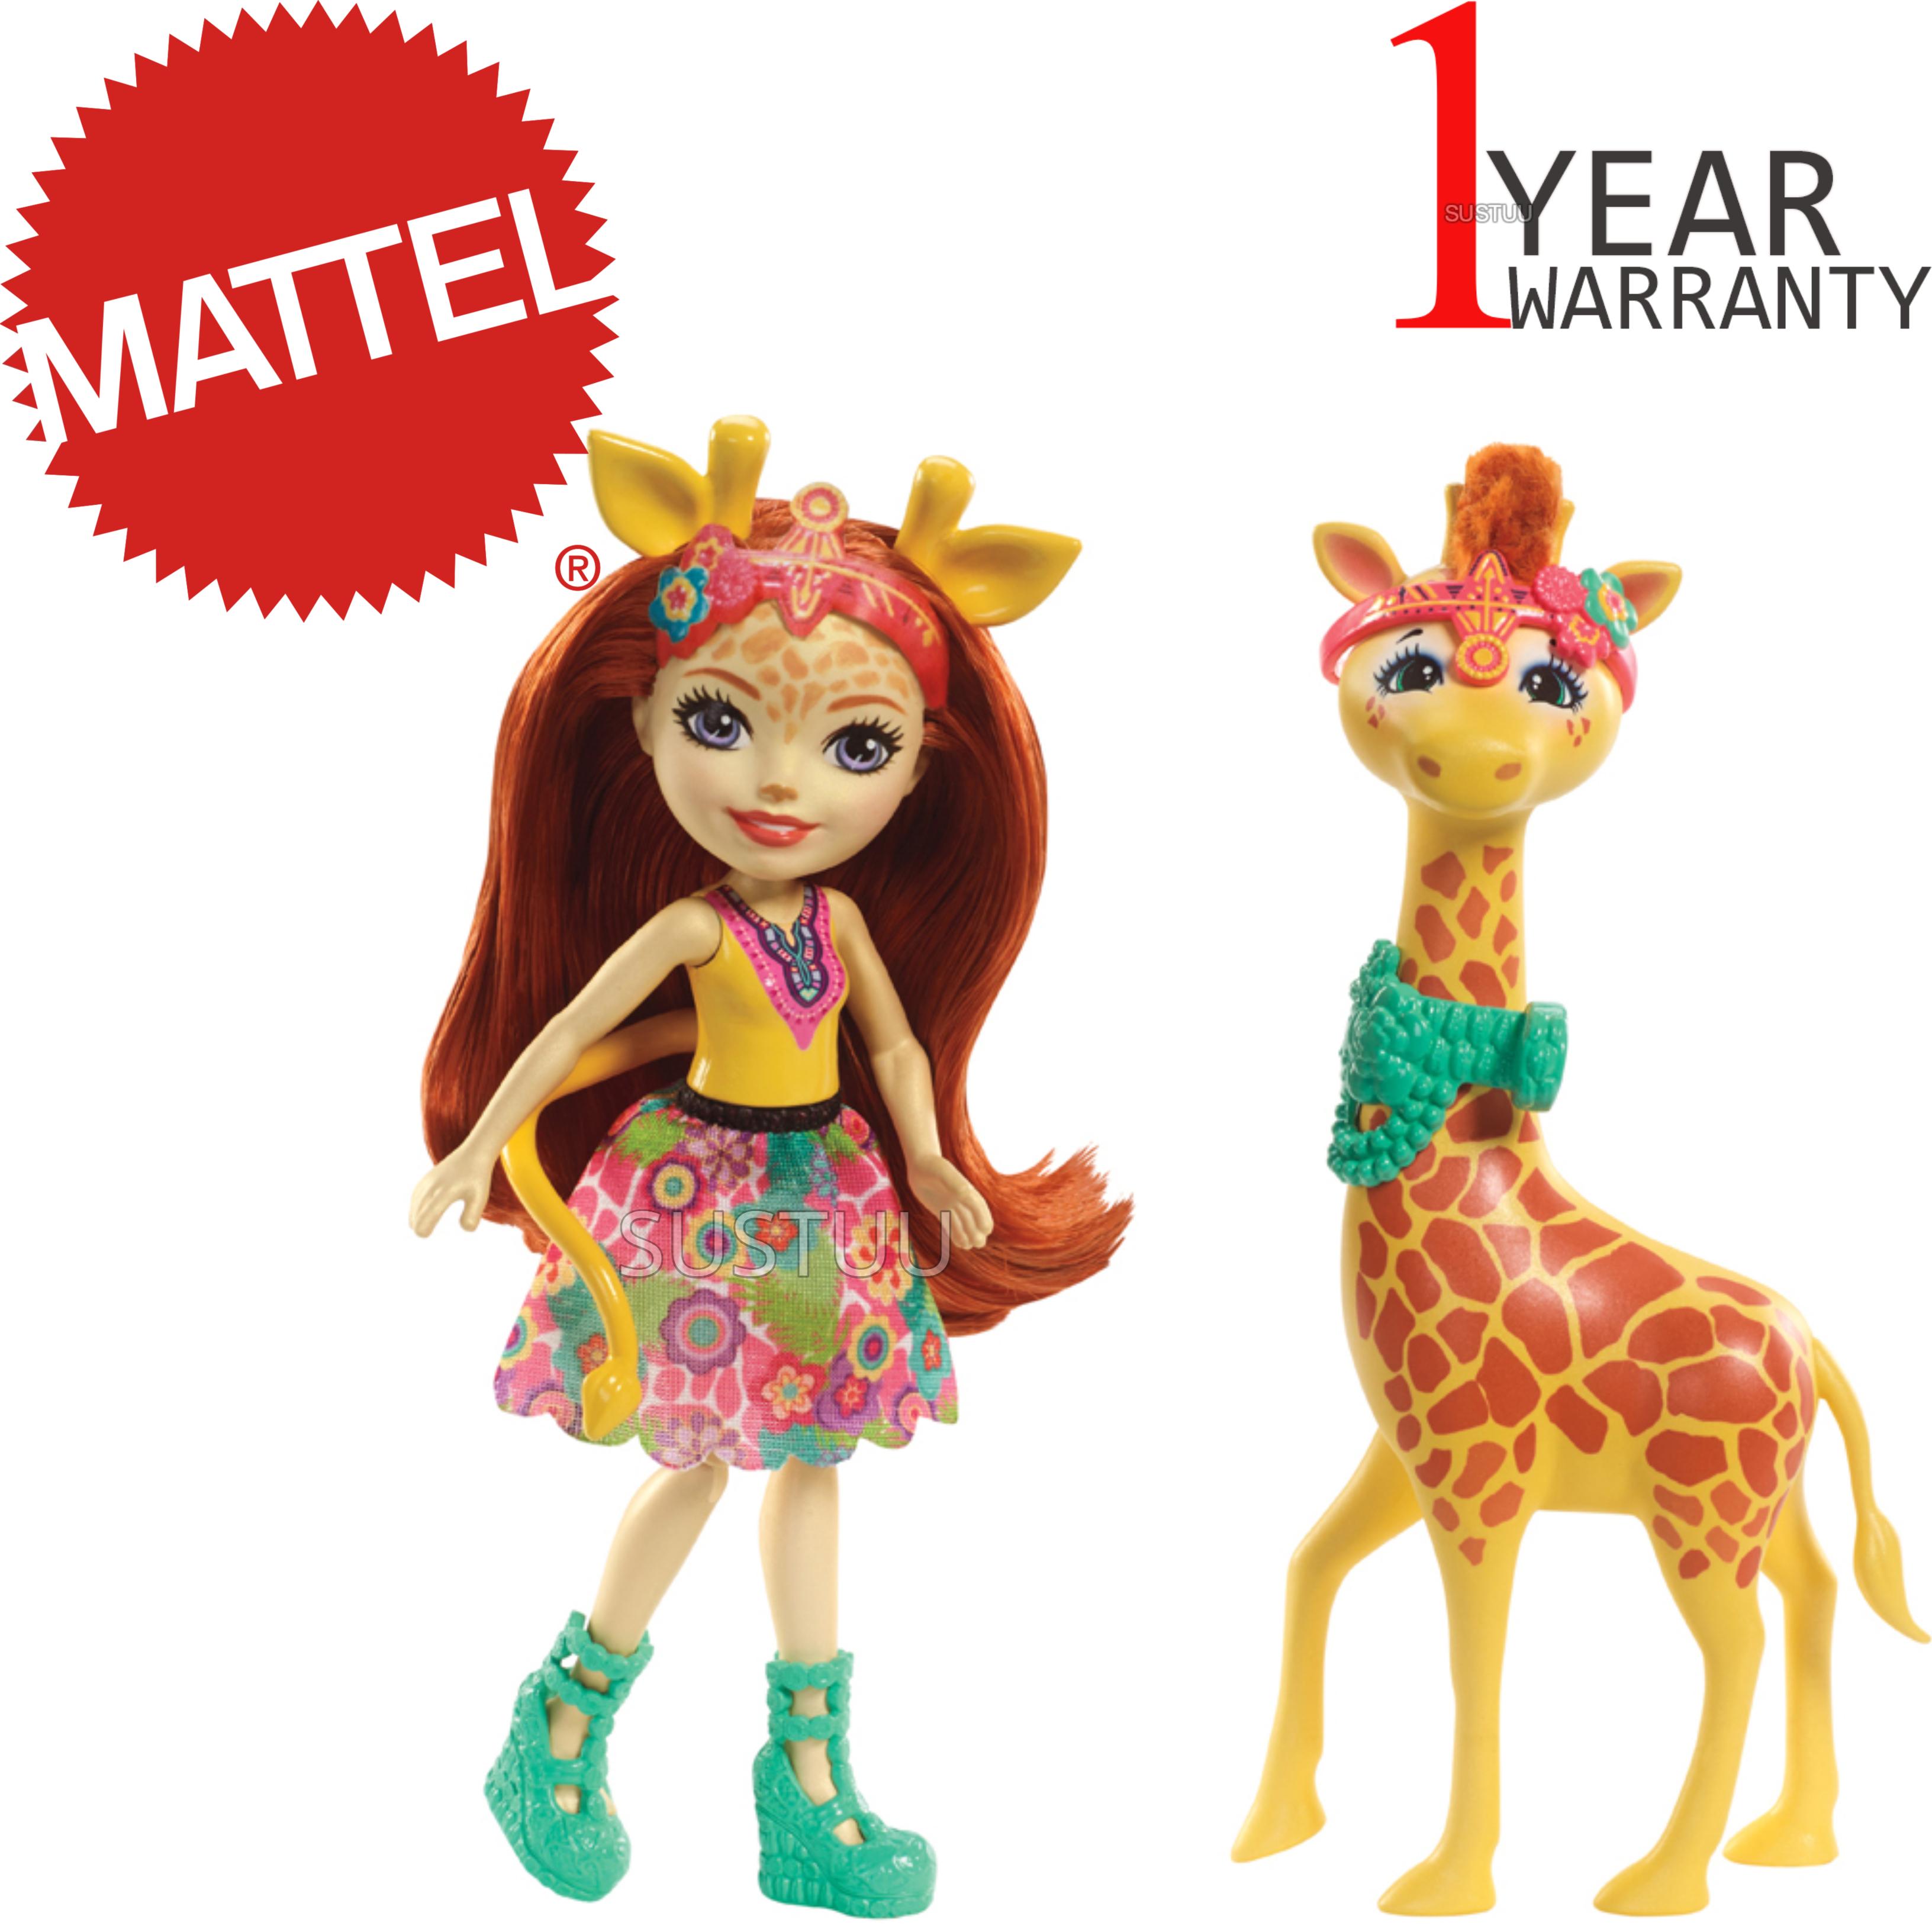 Enchantimals Large Giraffe and Gillian Doll | Kid's Antique Storytelling Play Set | +3 years